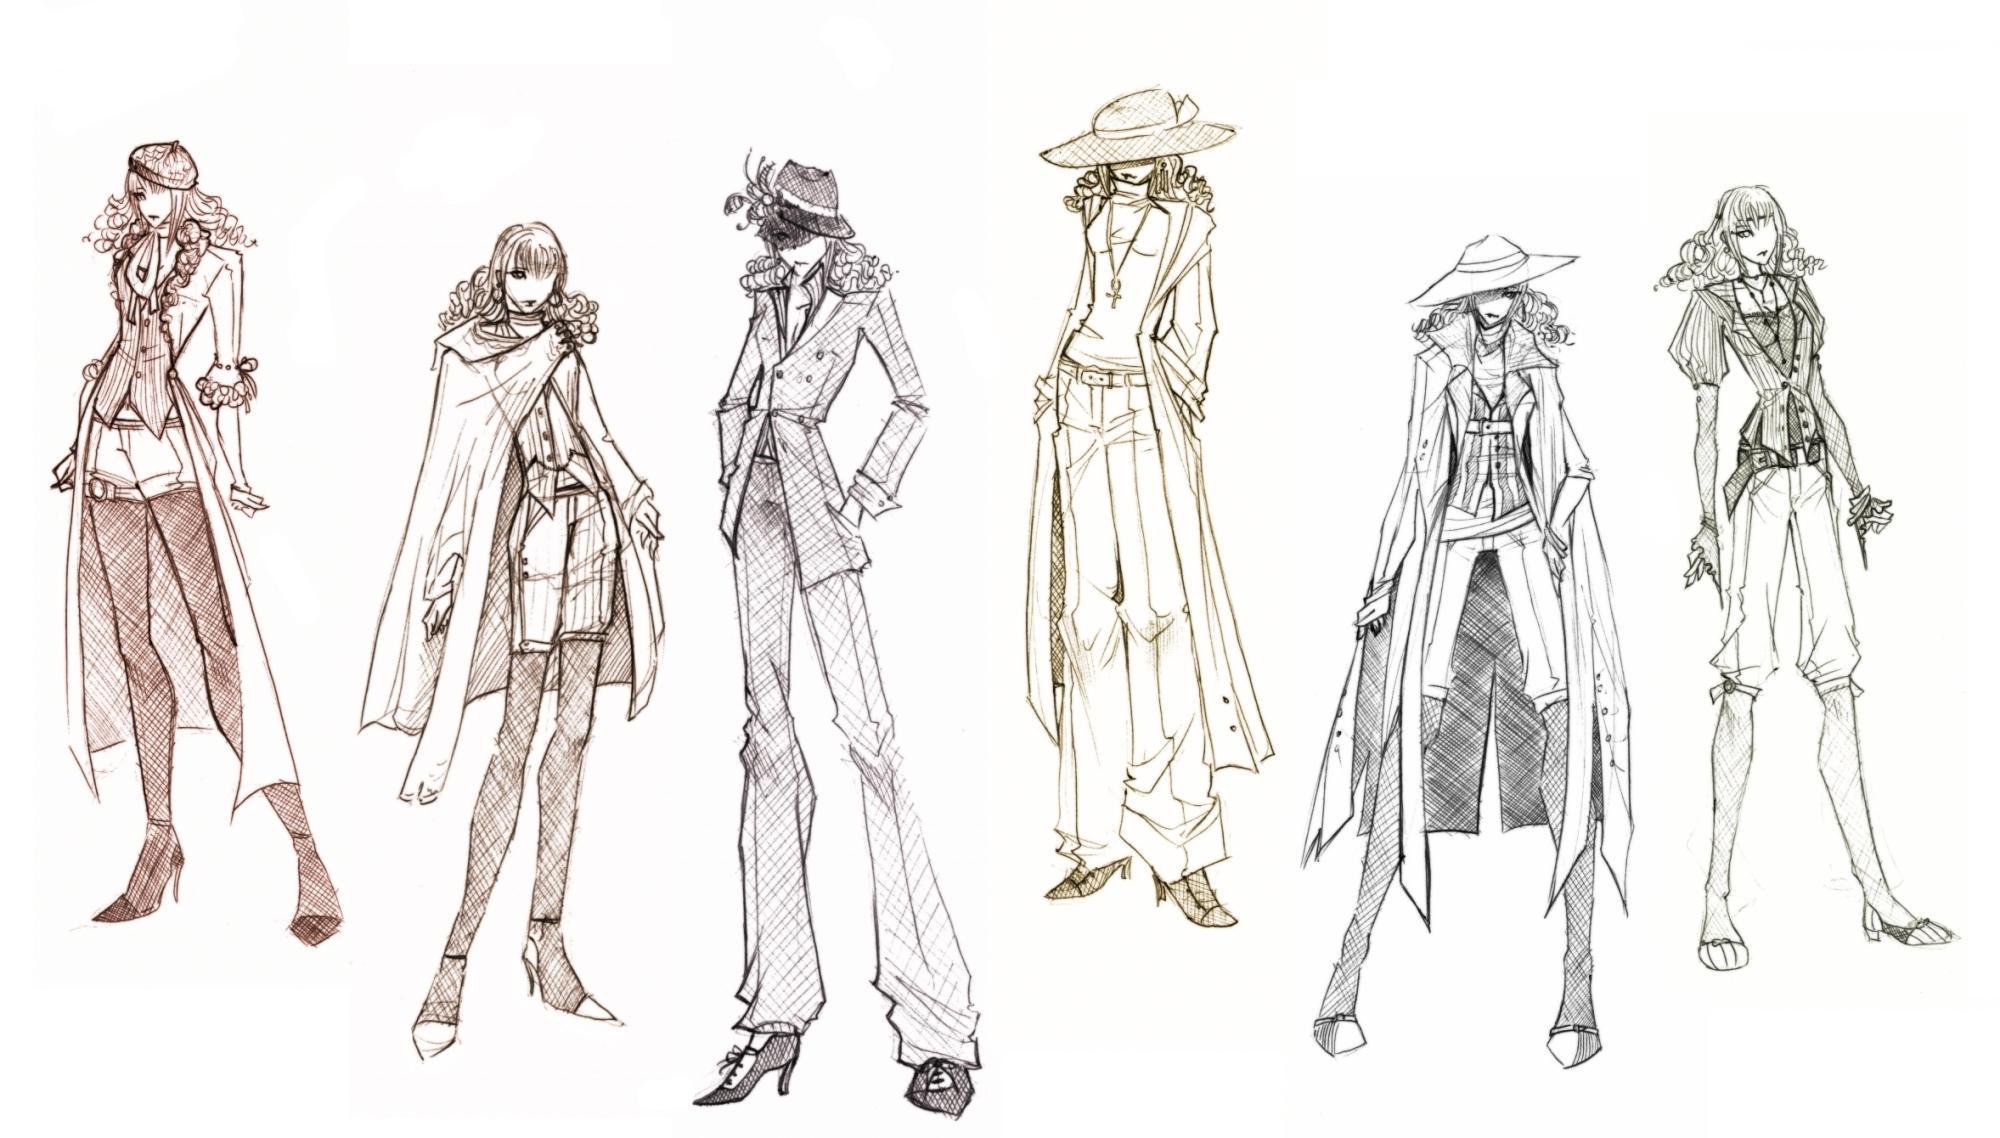 Sketches of Moretz clothing by Jethyn on DeviantArt